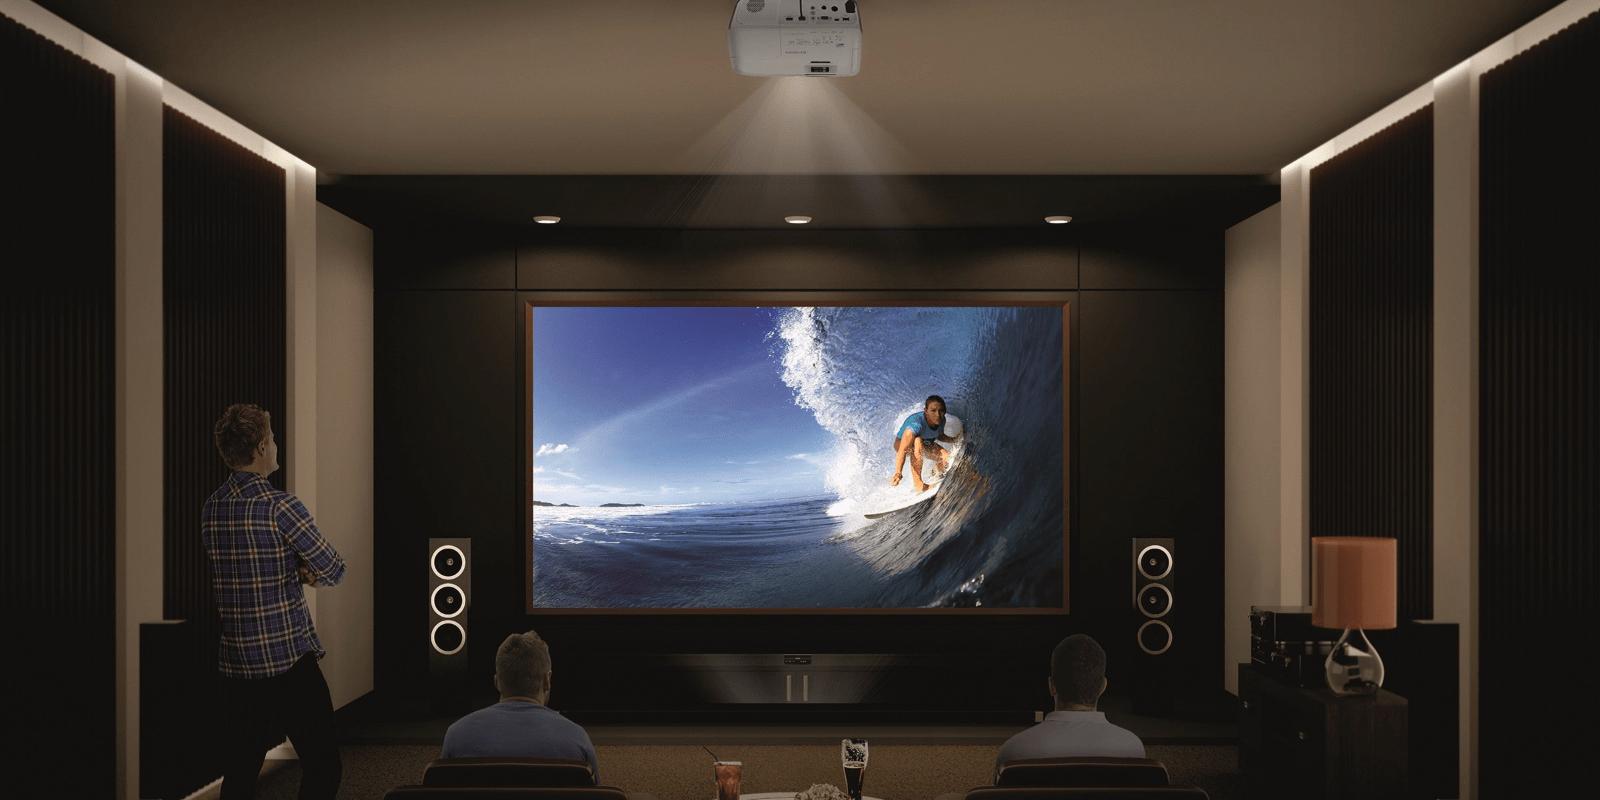 Best projector under $200